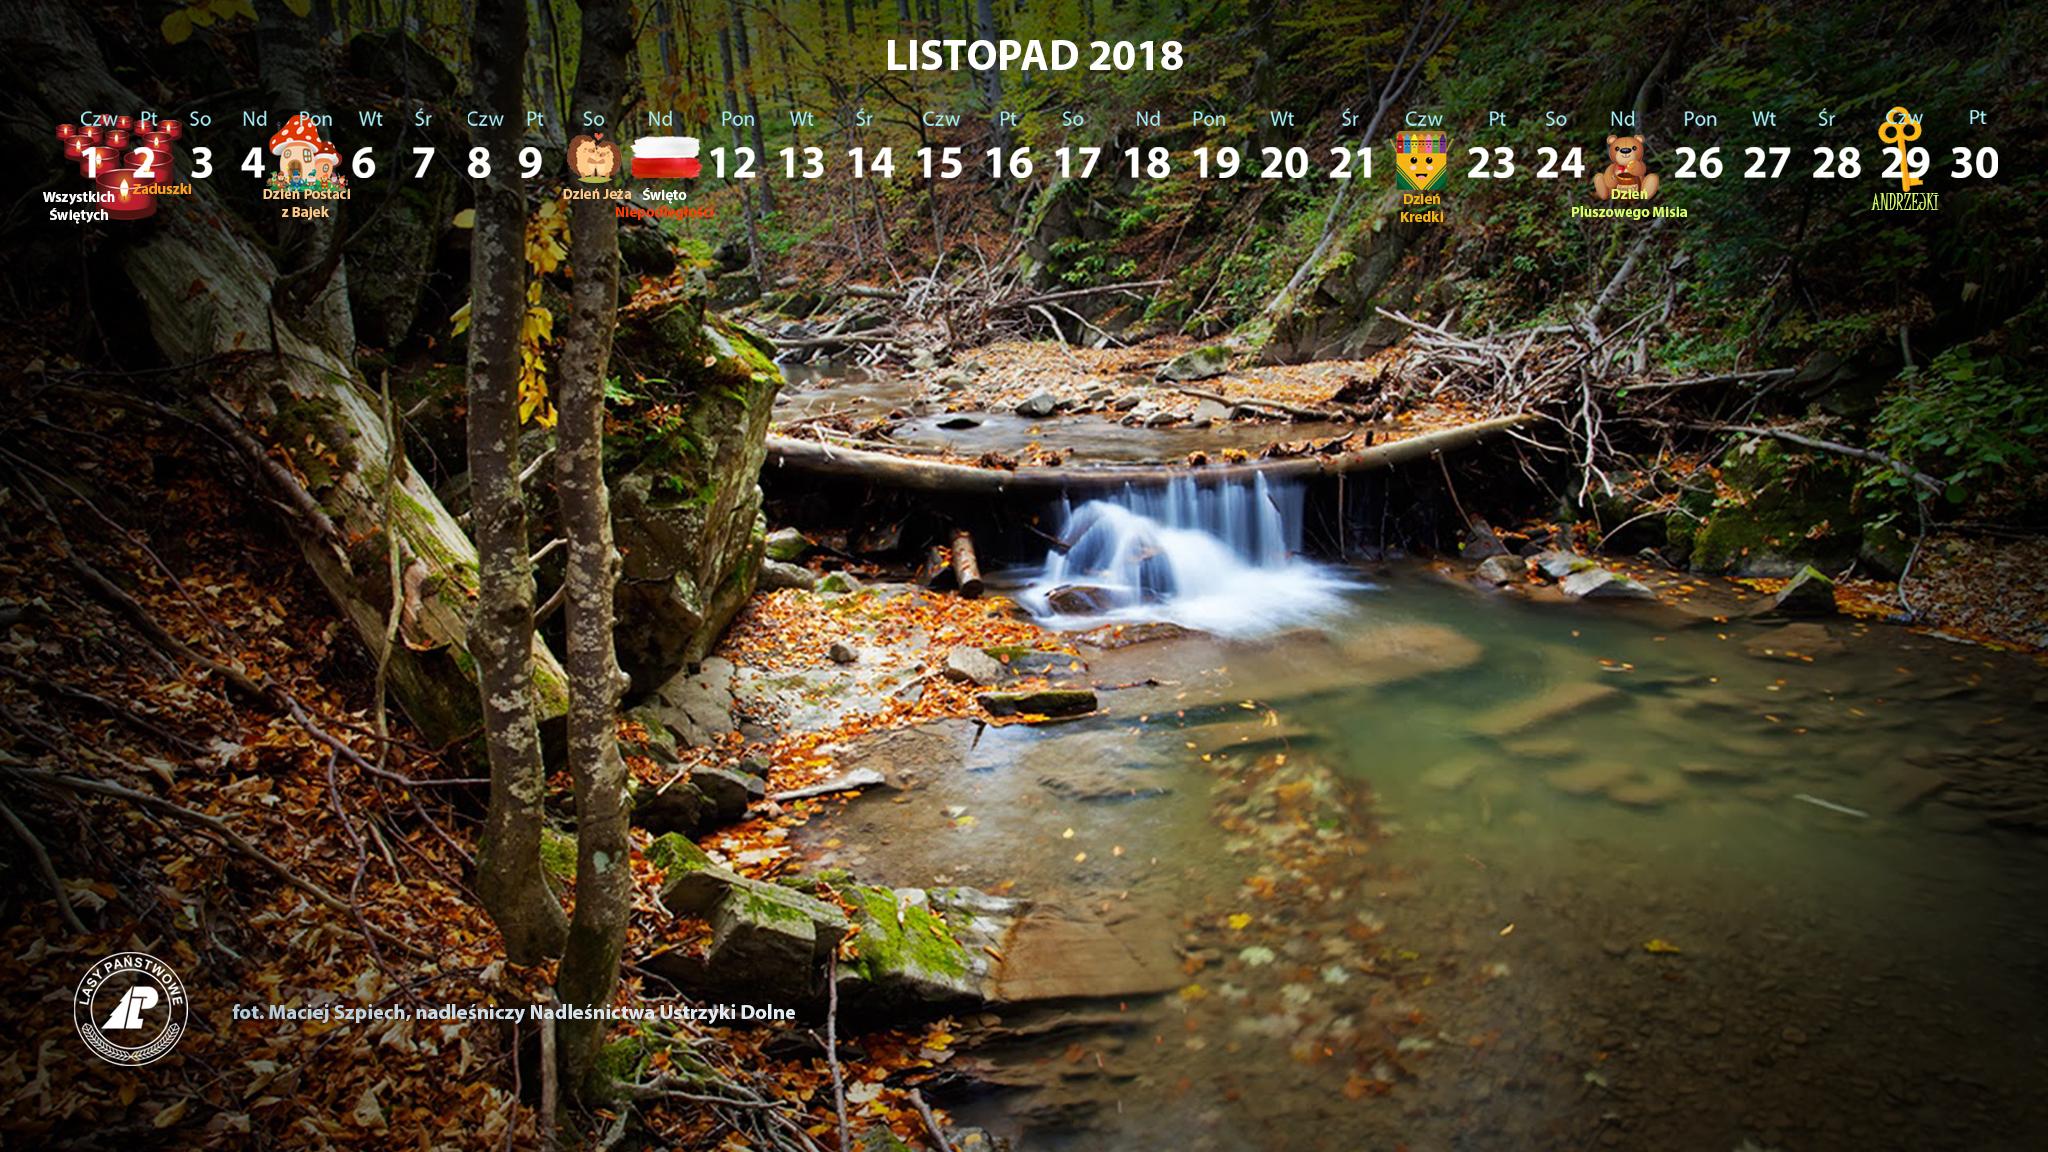 Kalendarz_listopad_2018_2048x1152[1].jpg